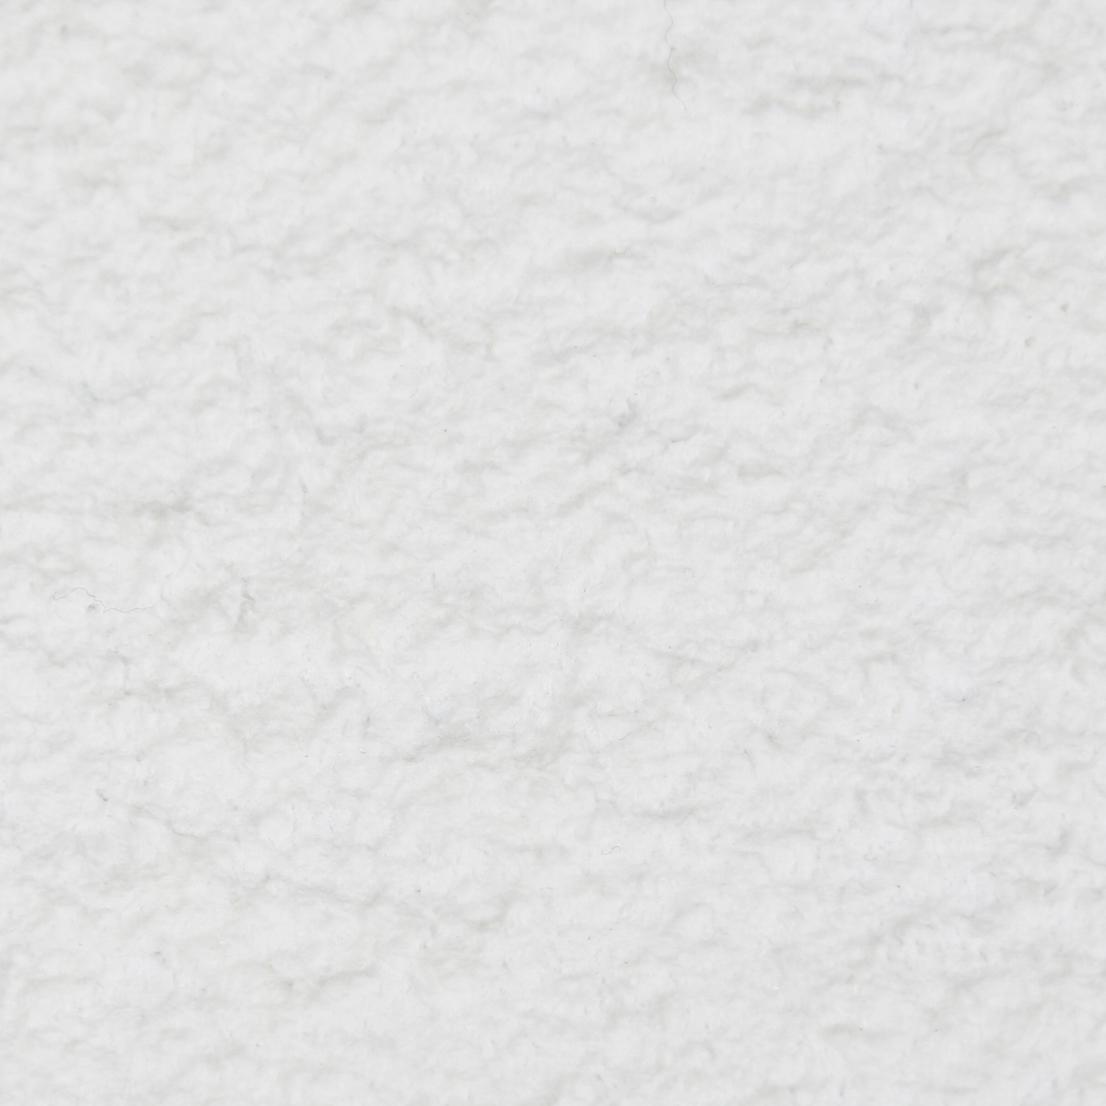 18 010 000 cotton pur white Wolcolor Baumwollputz